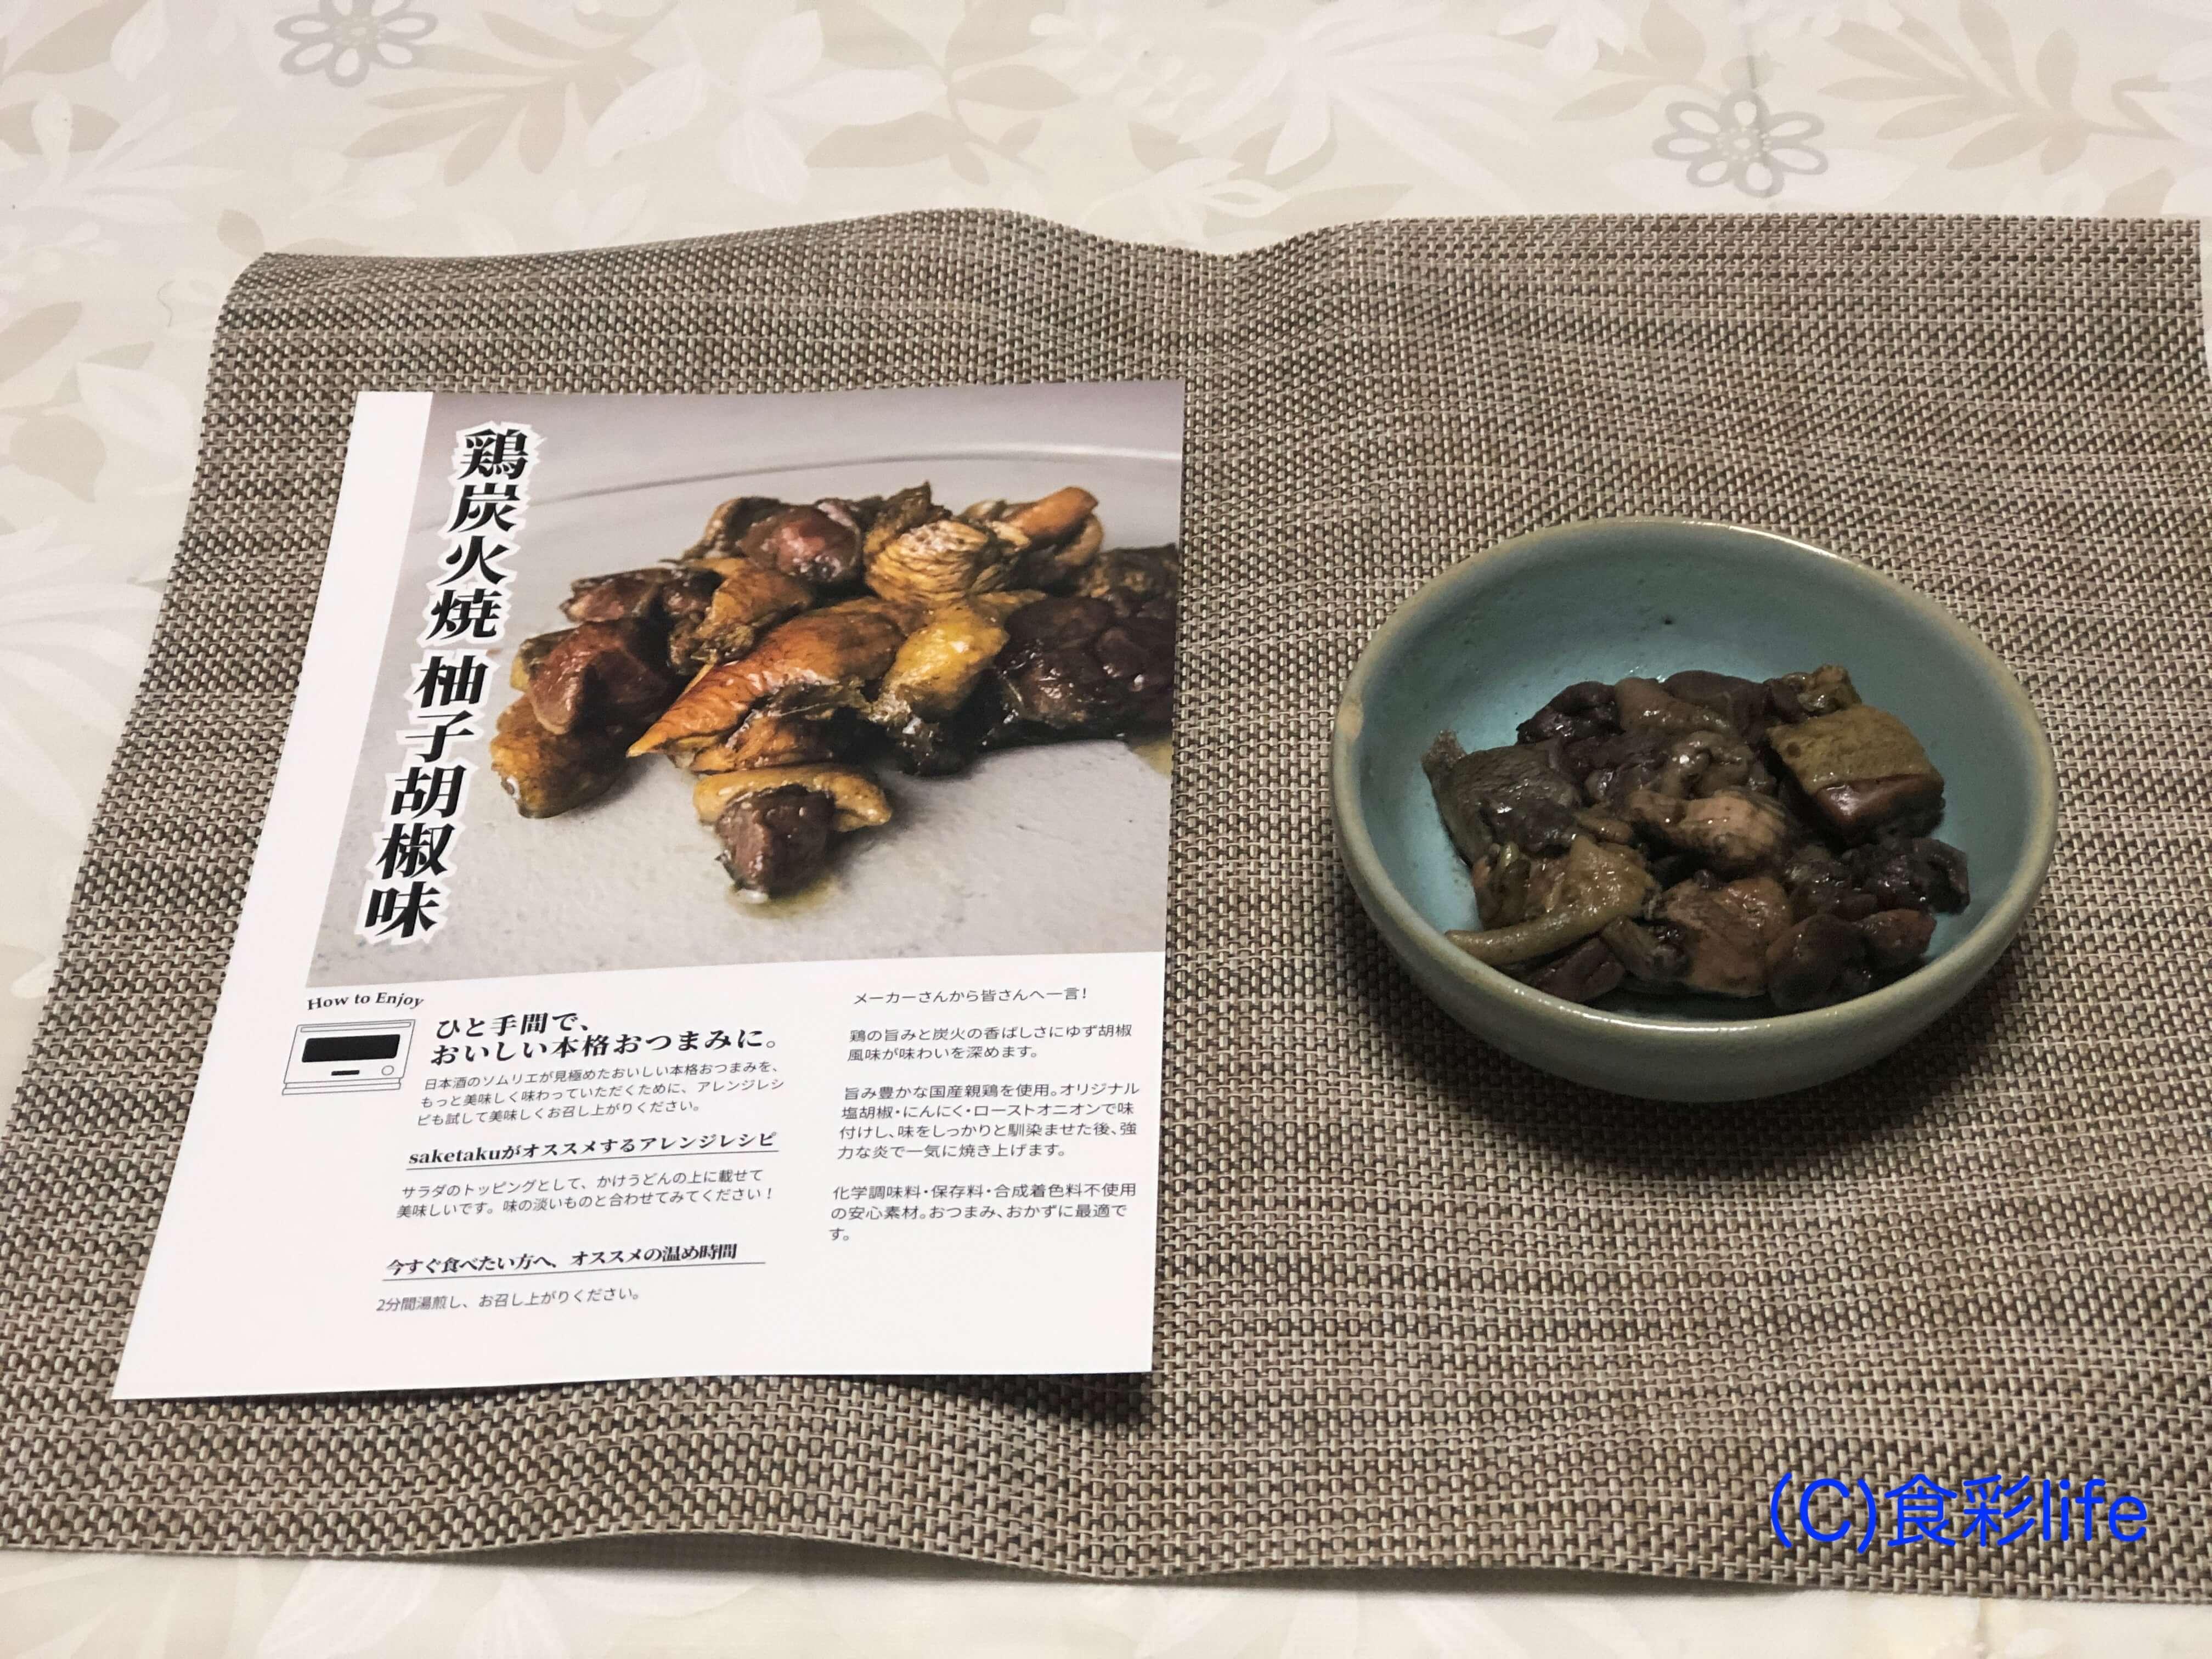 saketaku 2020年2月度配送分 おつまみ②